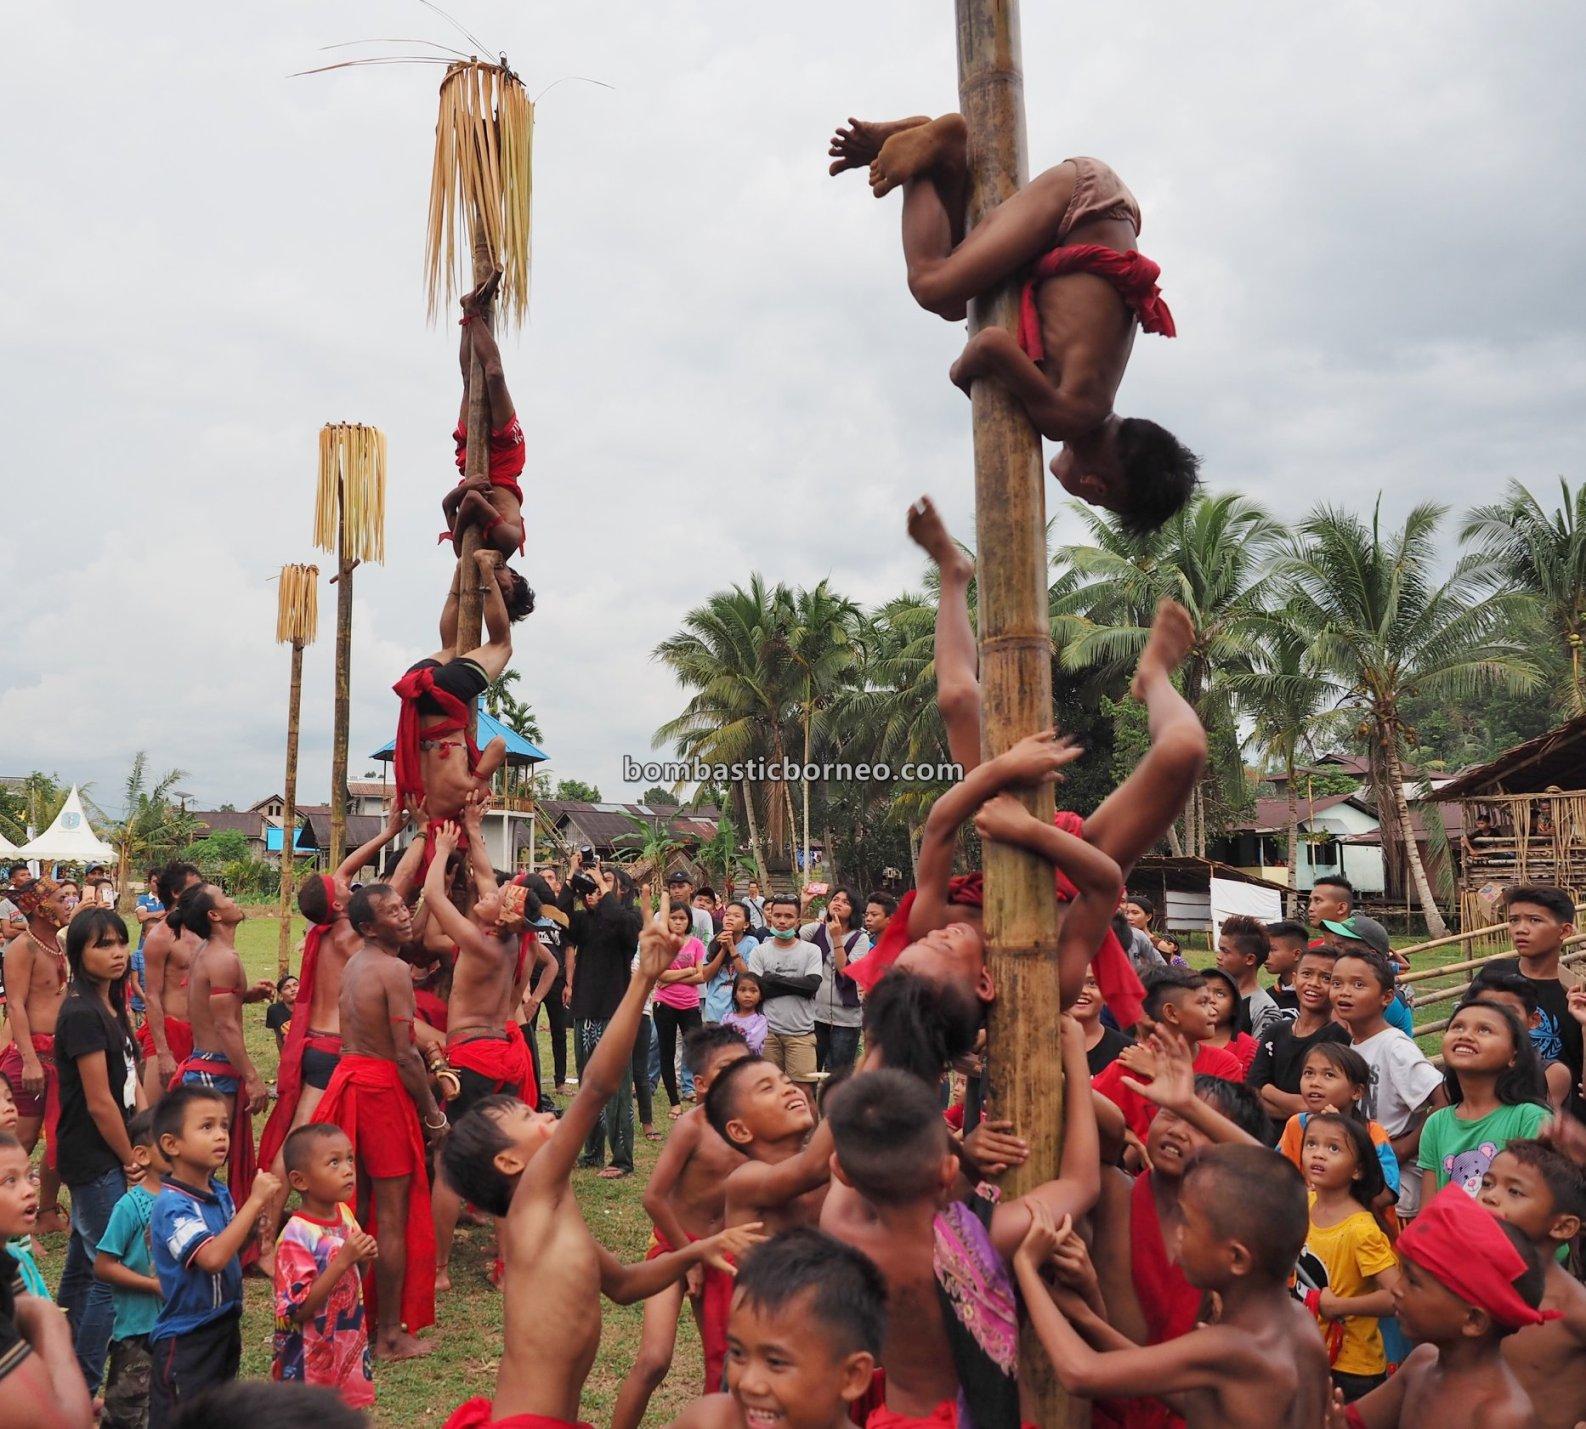 Nyobeng Sebujit, Gawai harvest festival, Dayak Bidayuh, traditional, village, Indonesia, West Kalimantan, Siding, native, backpackers, destination, obyek wisata, Tourism, travel guide, Trans Borneo, 比达友族丰收节日